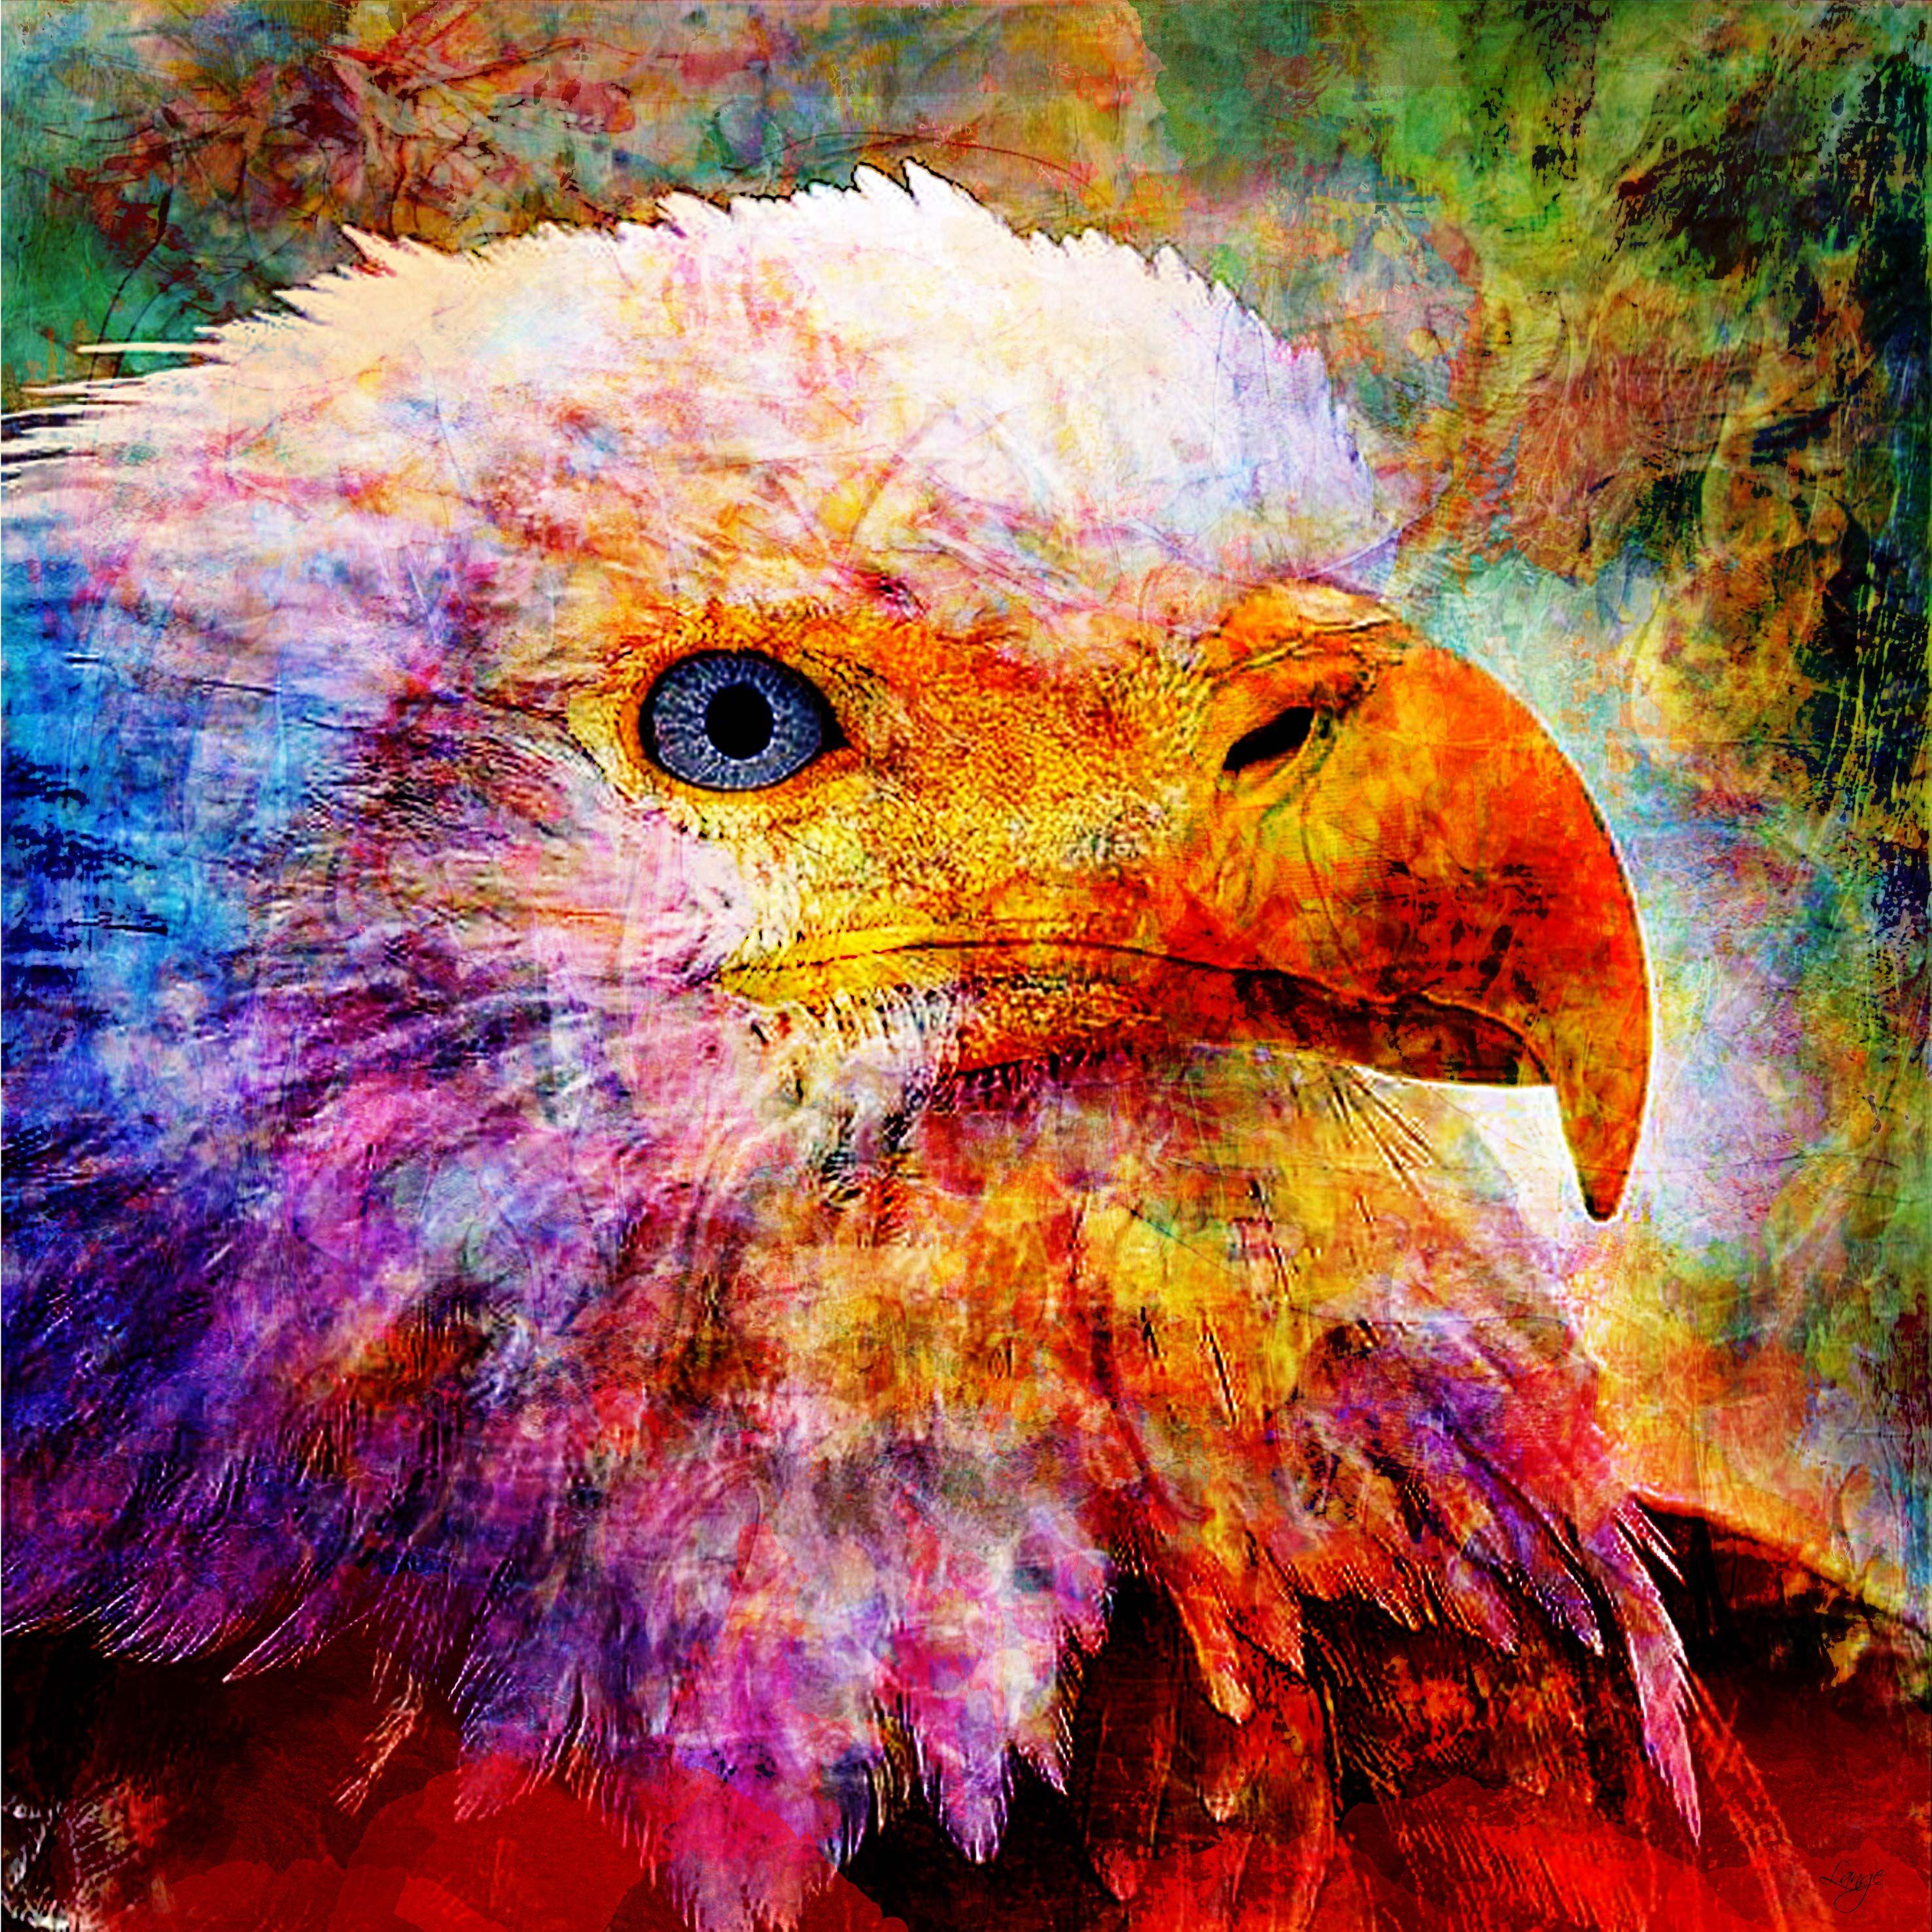 Aigle royal par idolie en 2019 aigle royal dessin et aigle - Dessin d aigle royal ...